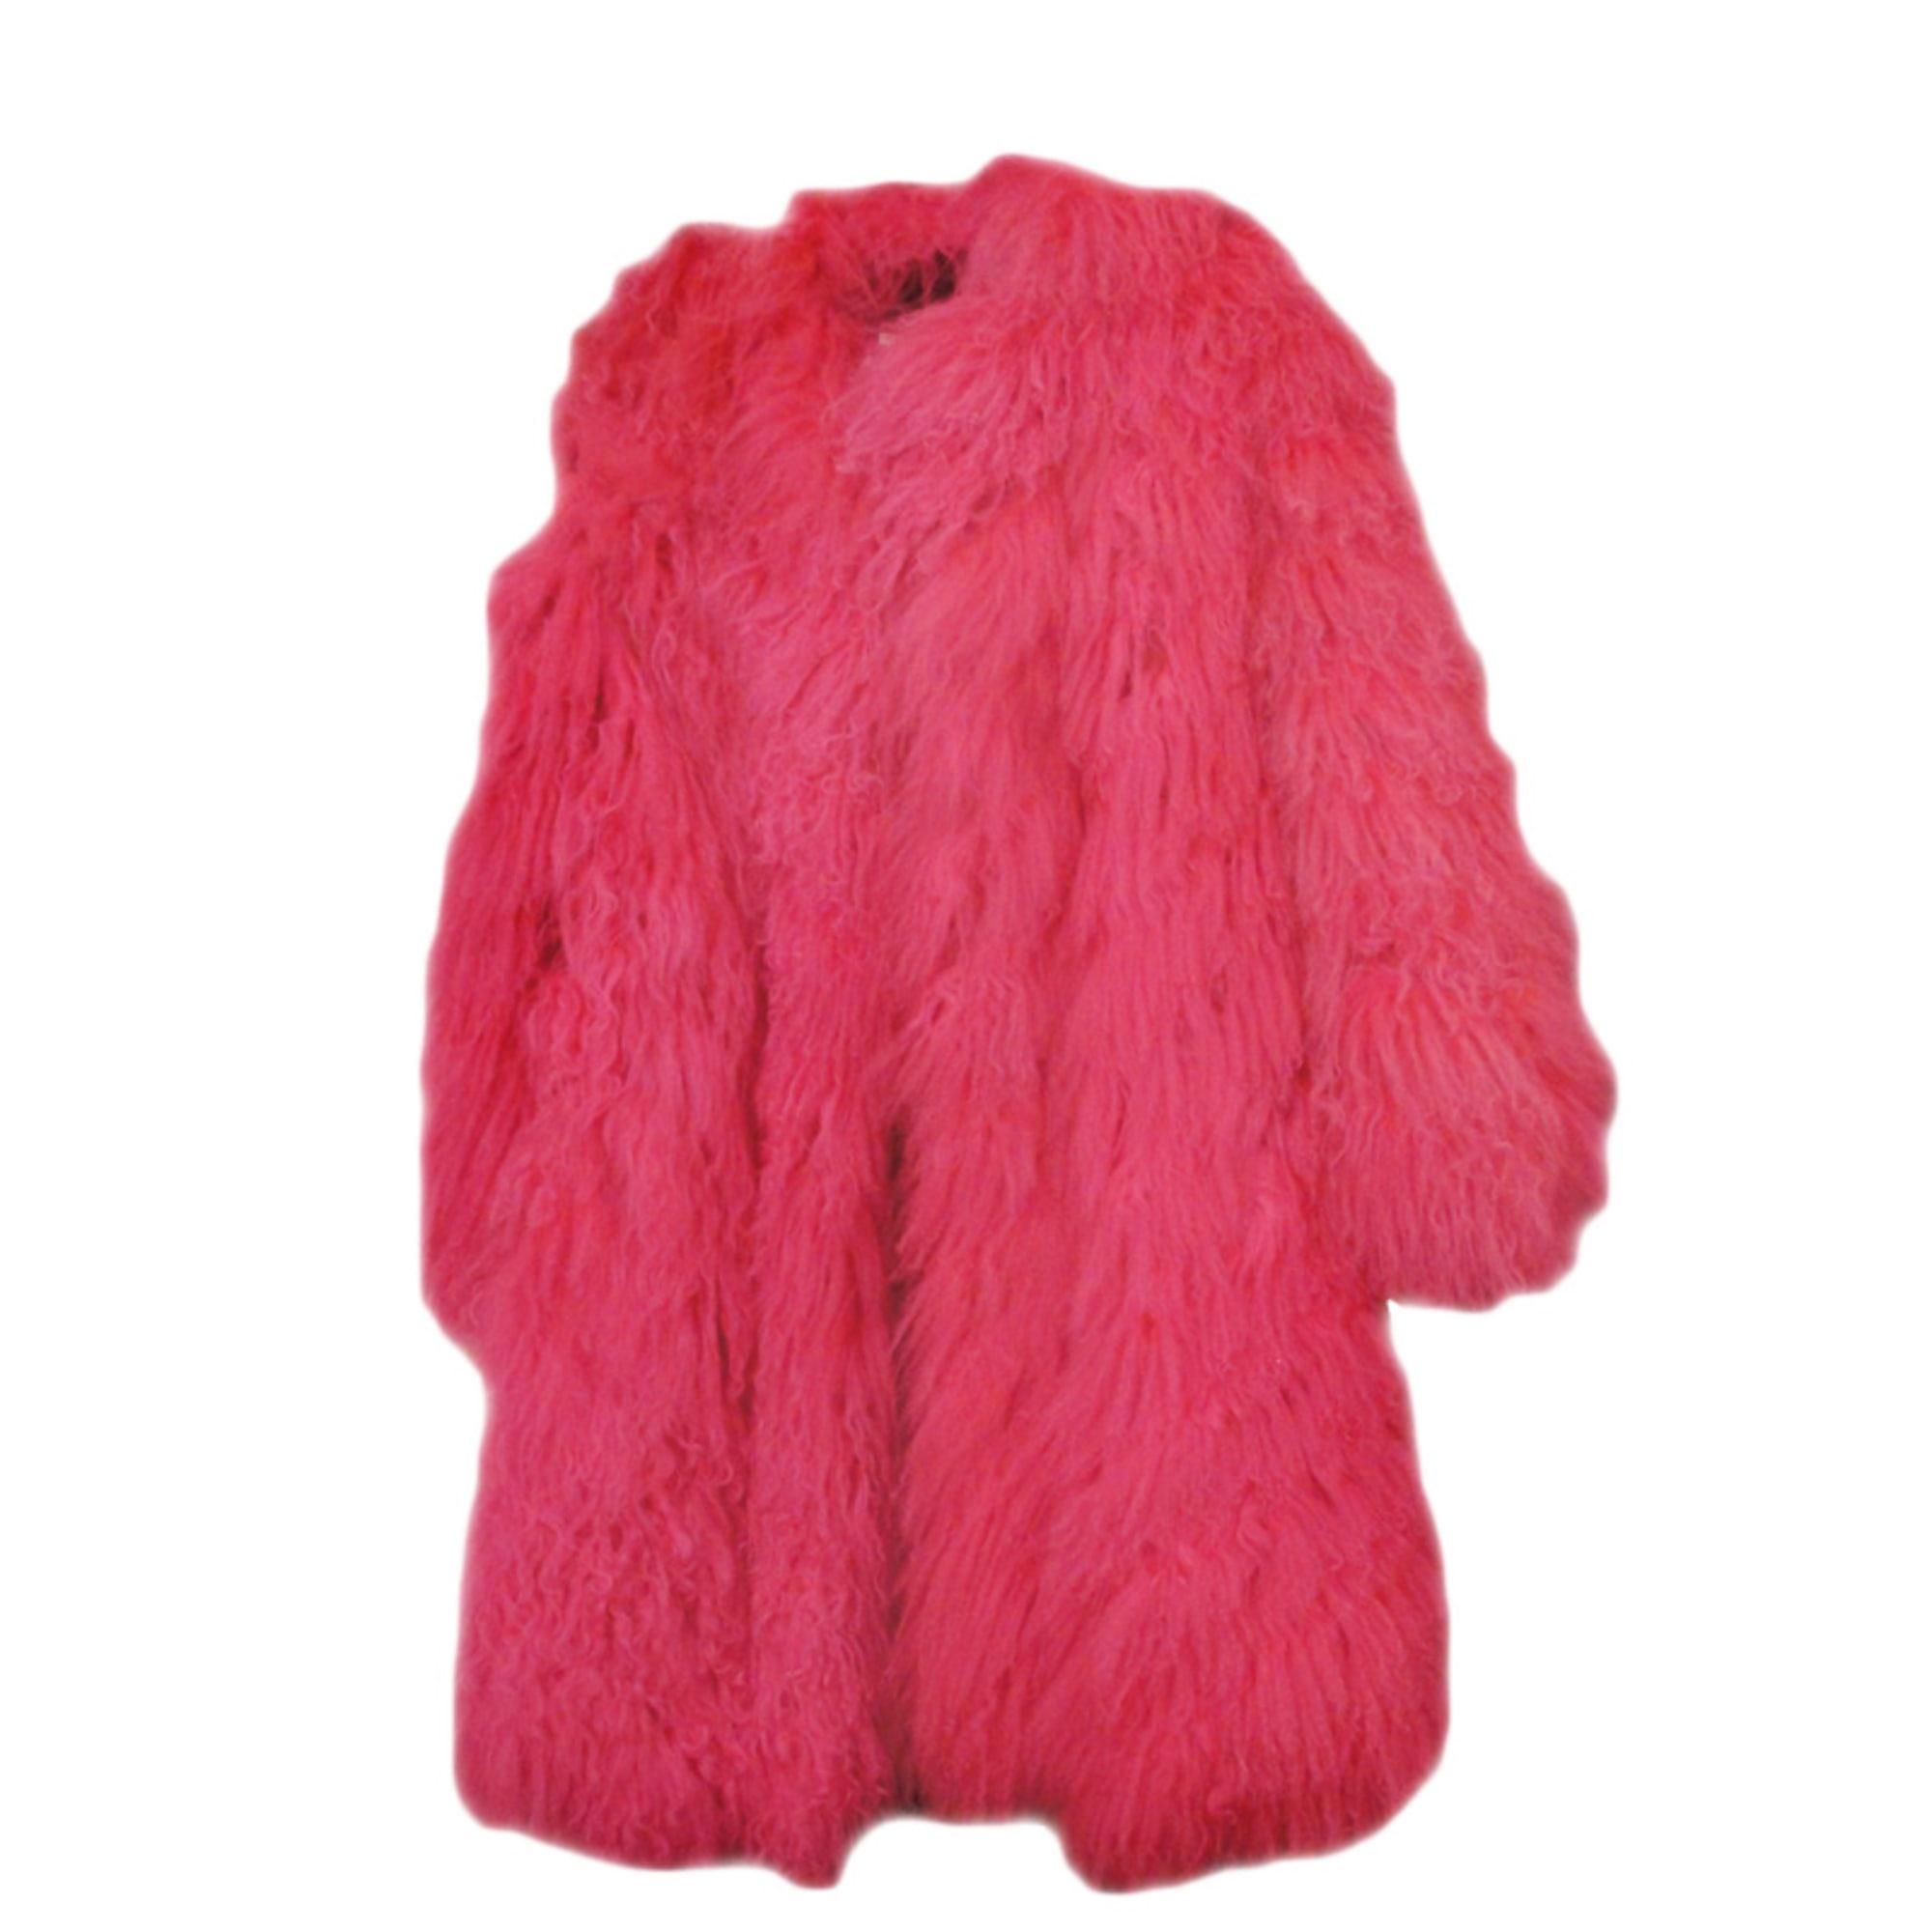 Manteau en fourrure SONIA RYKIEL 36 (S, T1) rose vendu par Jelena ... 599c66fd4a0